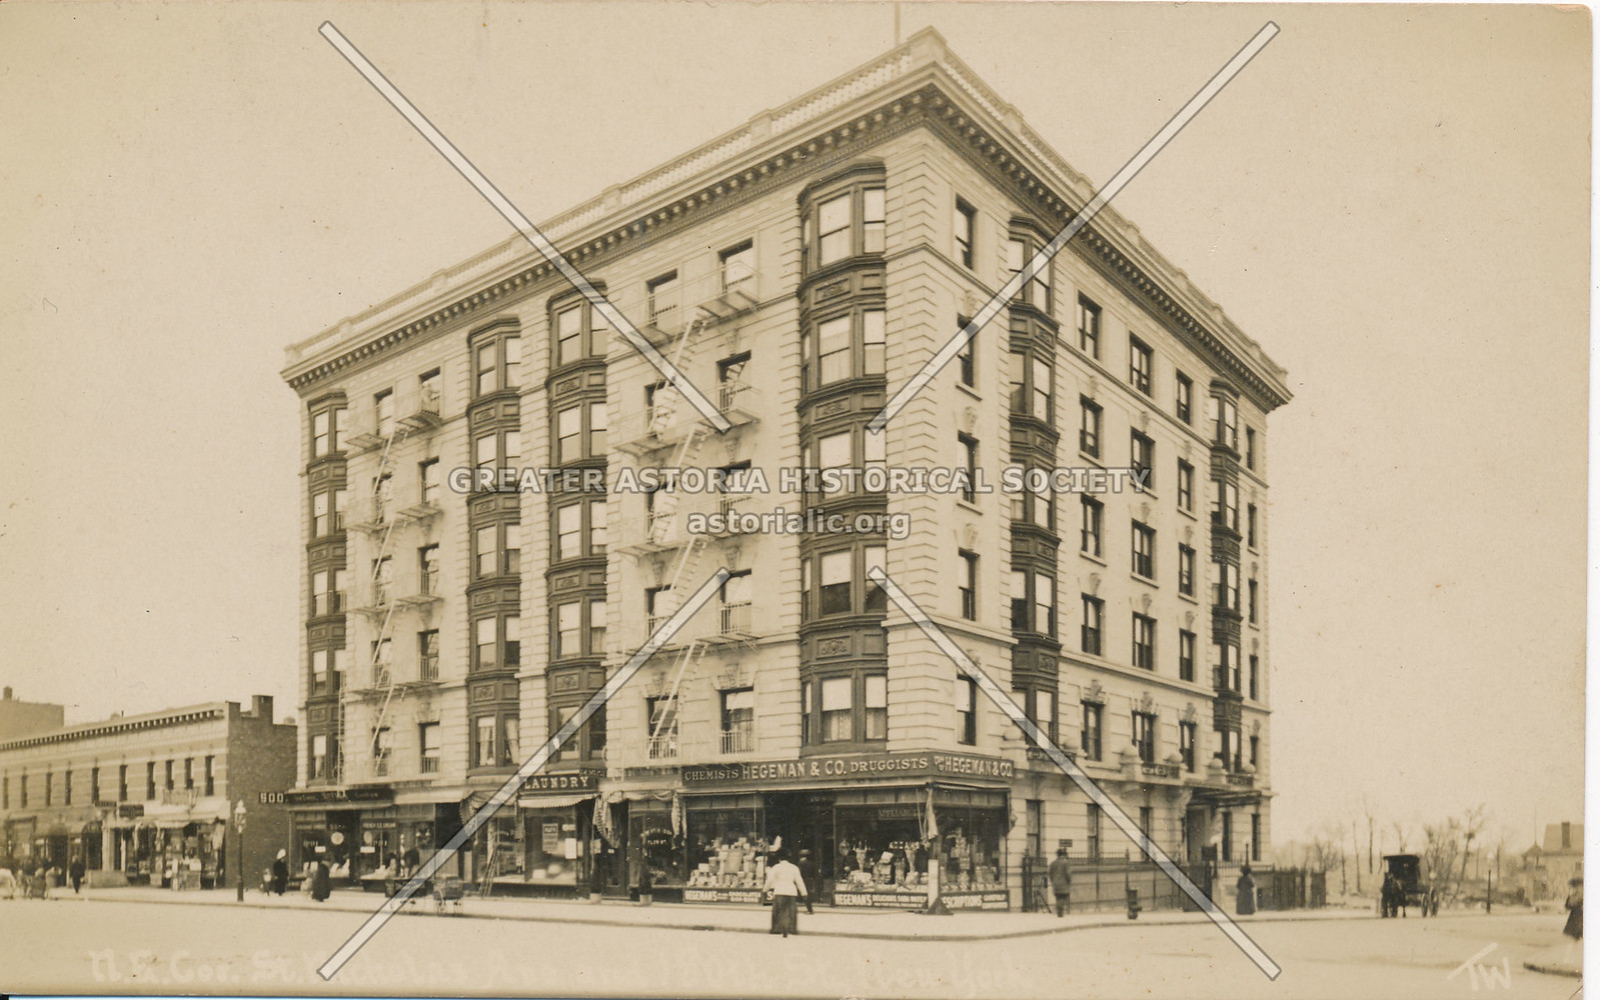 N.E. Cor., St. Nicholas Ave & 180th St., N.Y.